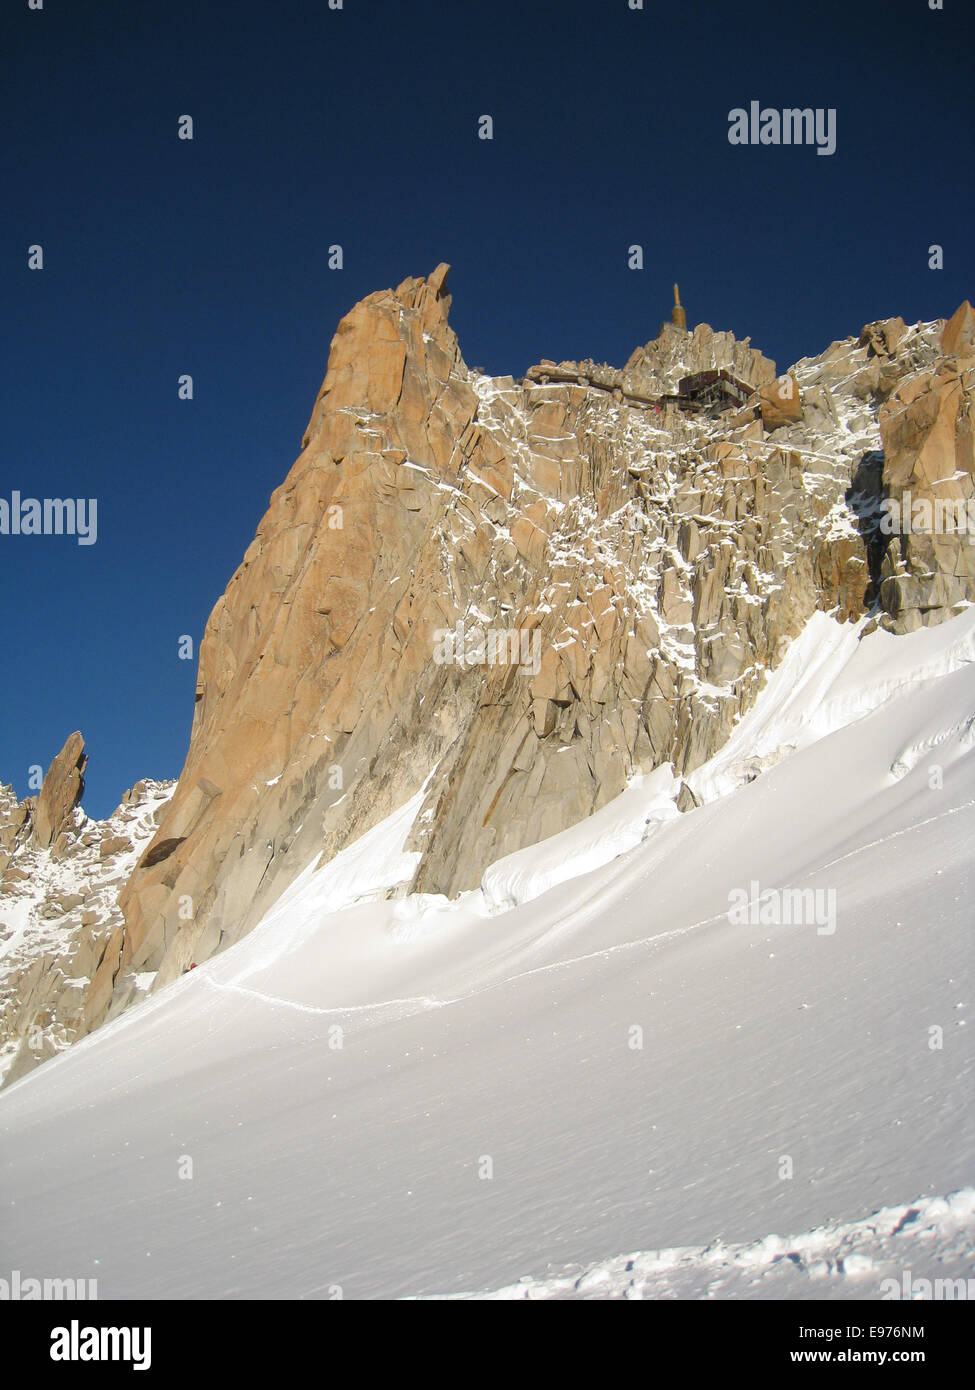 Rock wall underneath the Aiguille du Midi above Chamonix - Stock Image